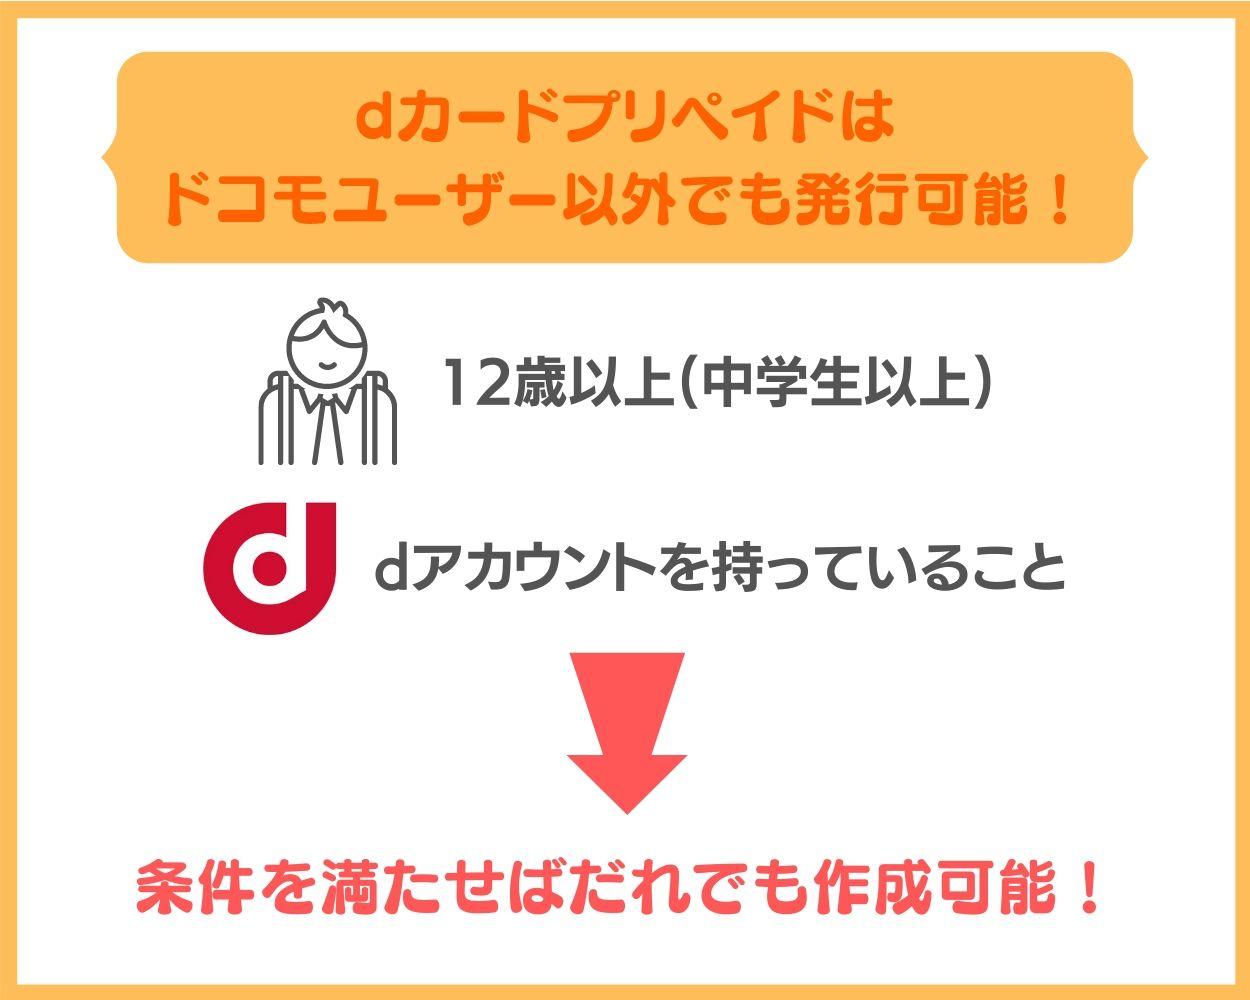 dカードプリペイドはドコモユーザー以外でも発行可能!